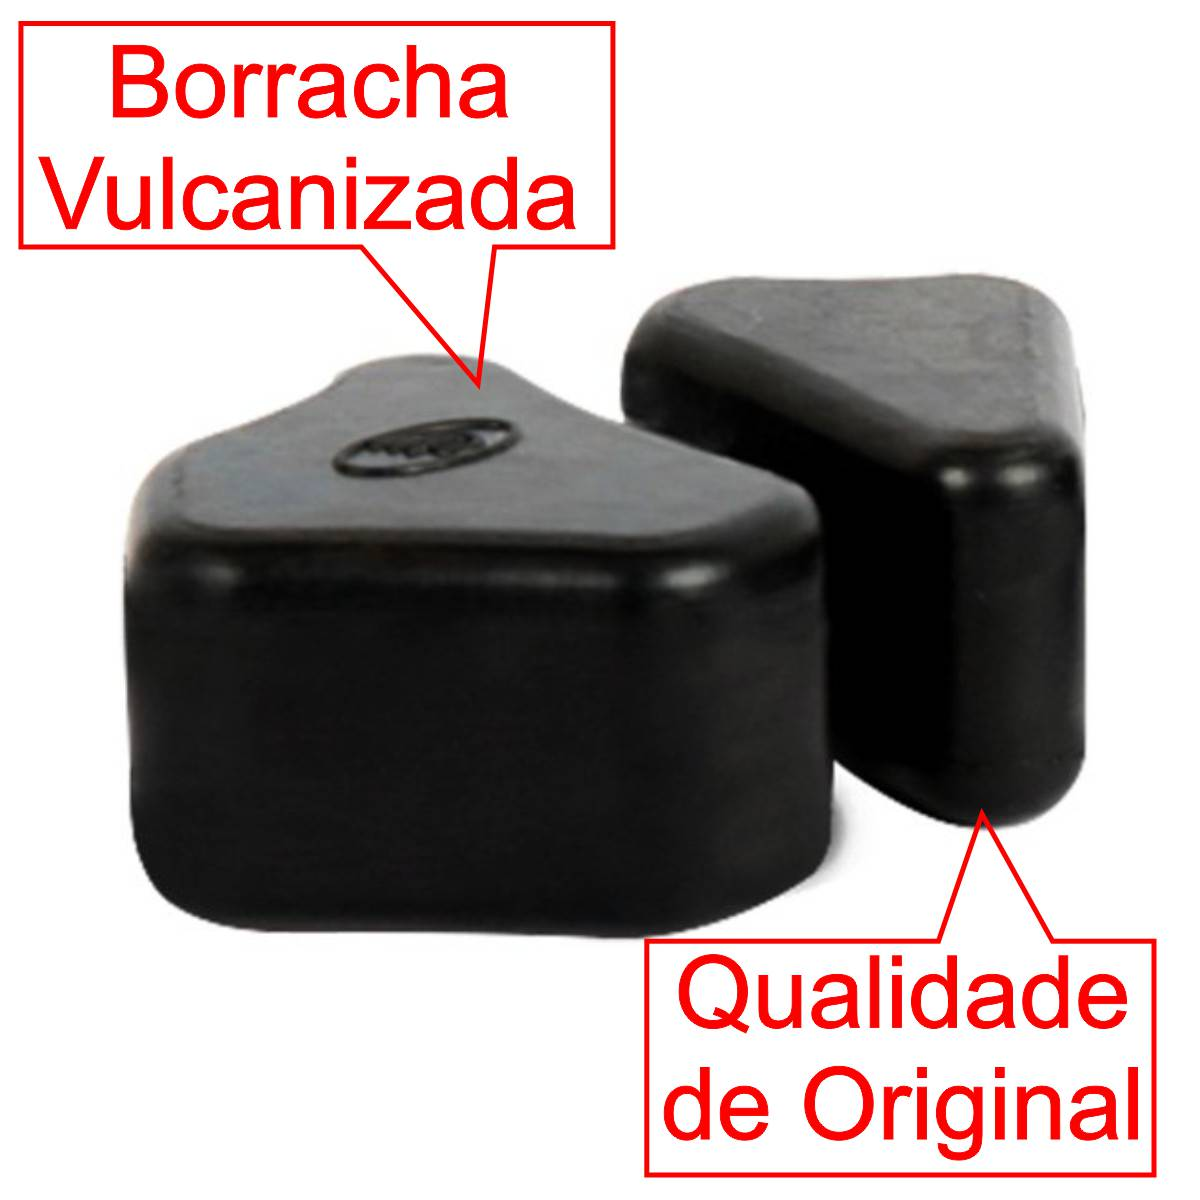 KIT COXIM BORRACHA BUCHA DA COROA RODA TRASEIRA CG FAN TITAN 150 160 JOGO 4 PEÇAS + GRAXA SPRAY 60ml